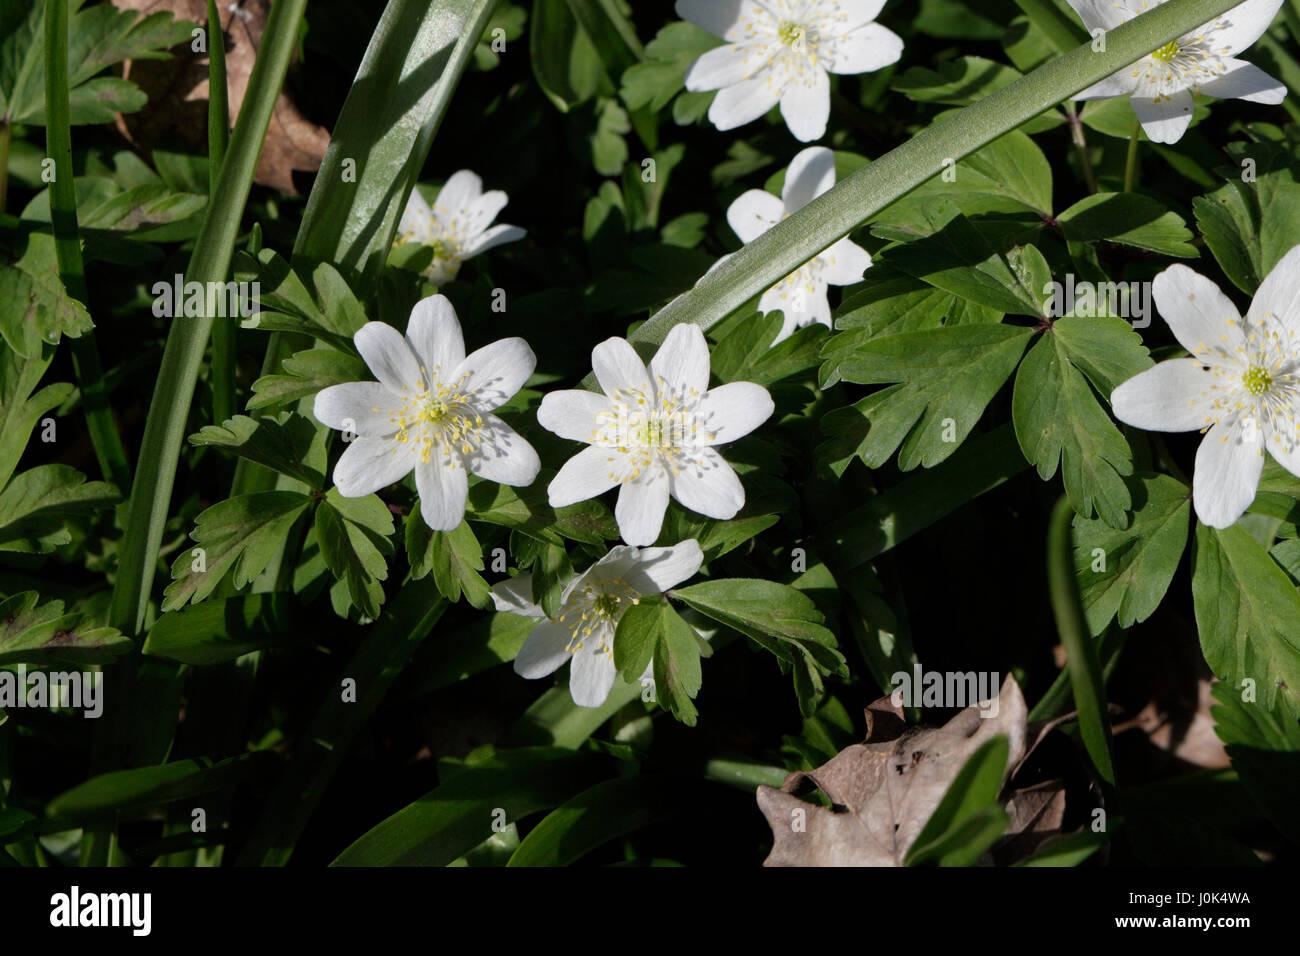 White Wild Woodland Flowers In Bloom Stock Photo 138103878 Alamy